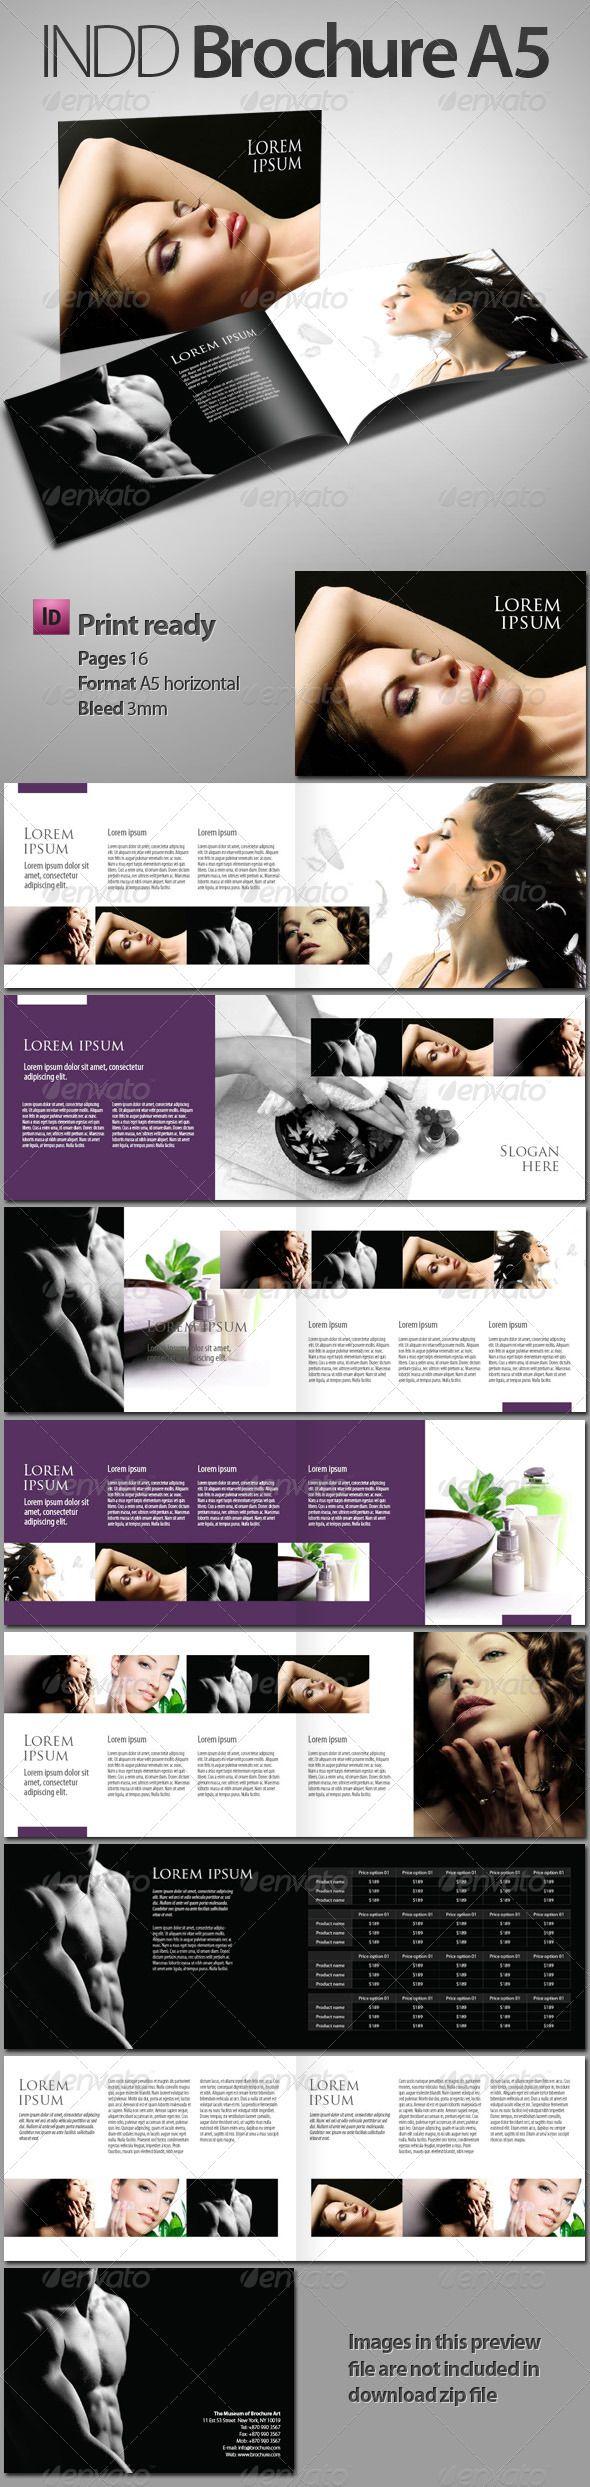 259 best Brochure Templates images on Pinterest   Brochure template ...